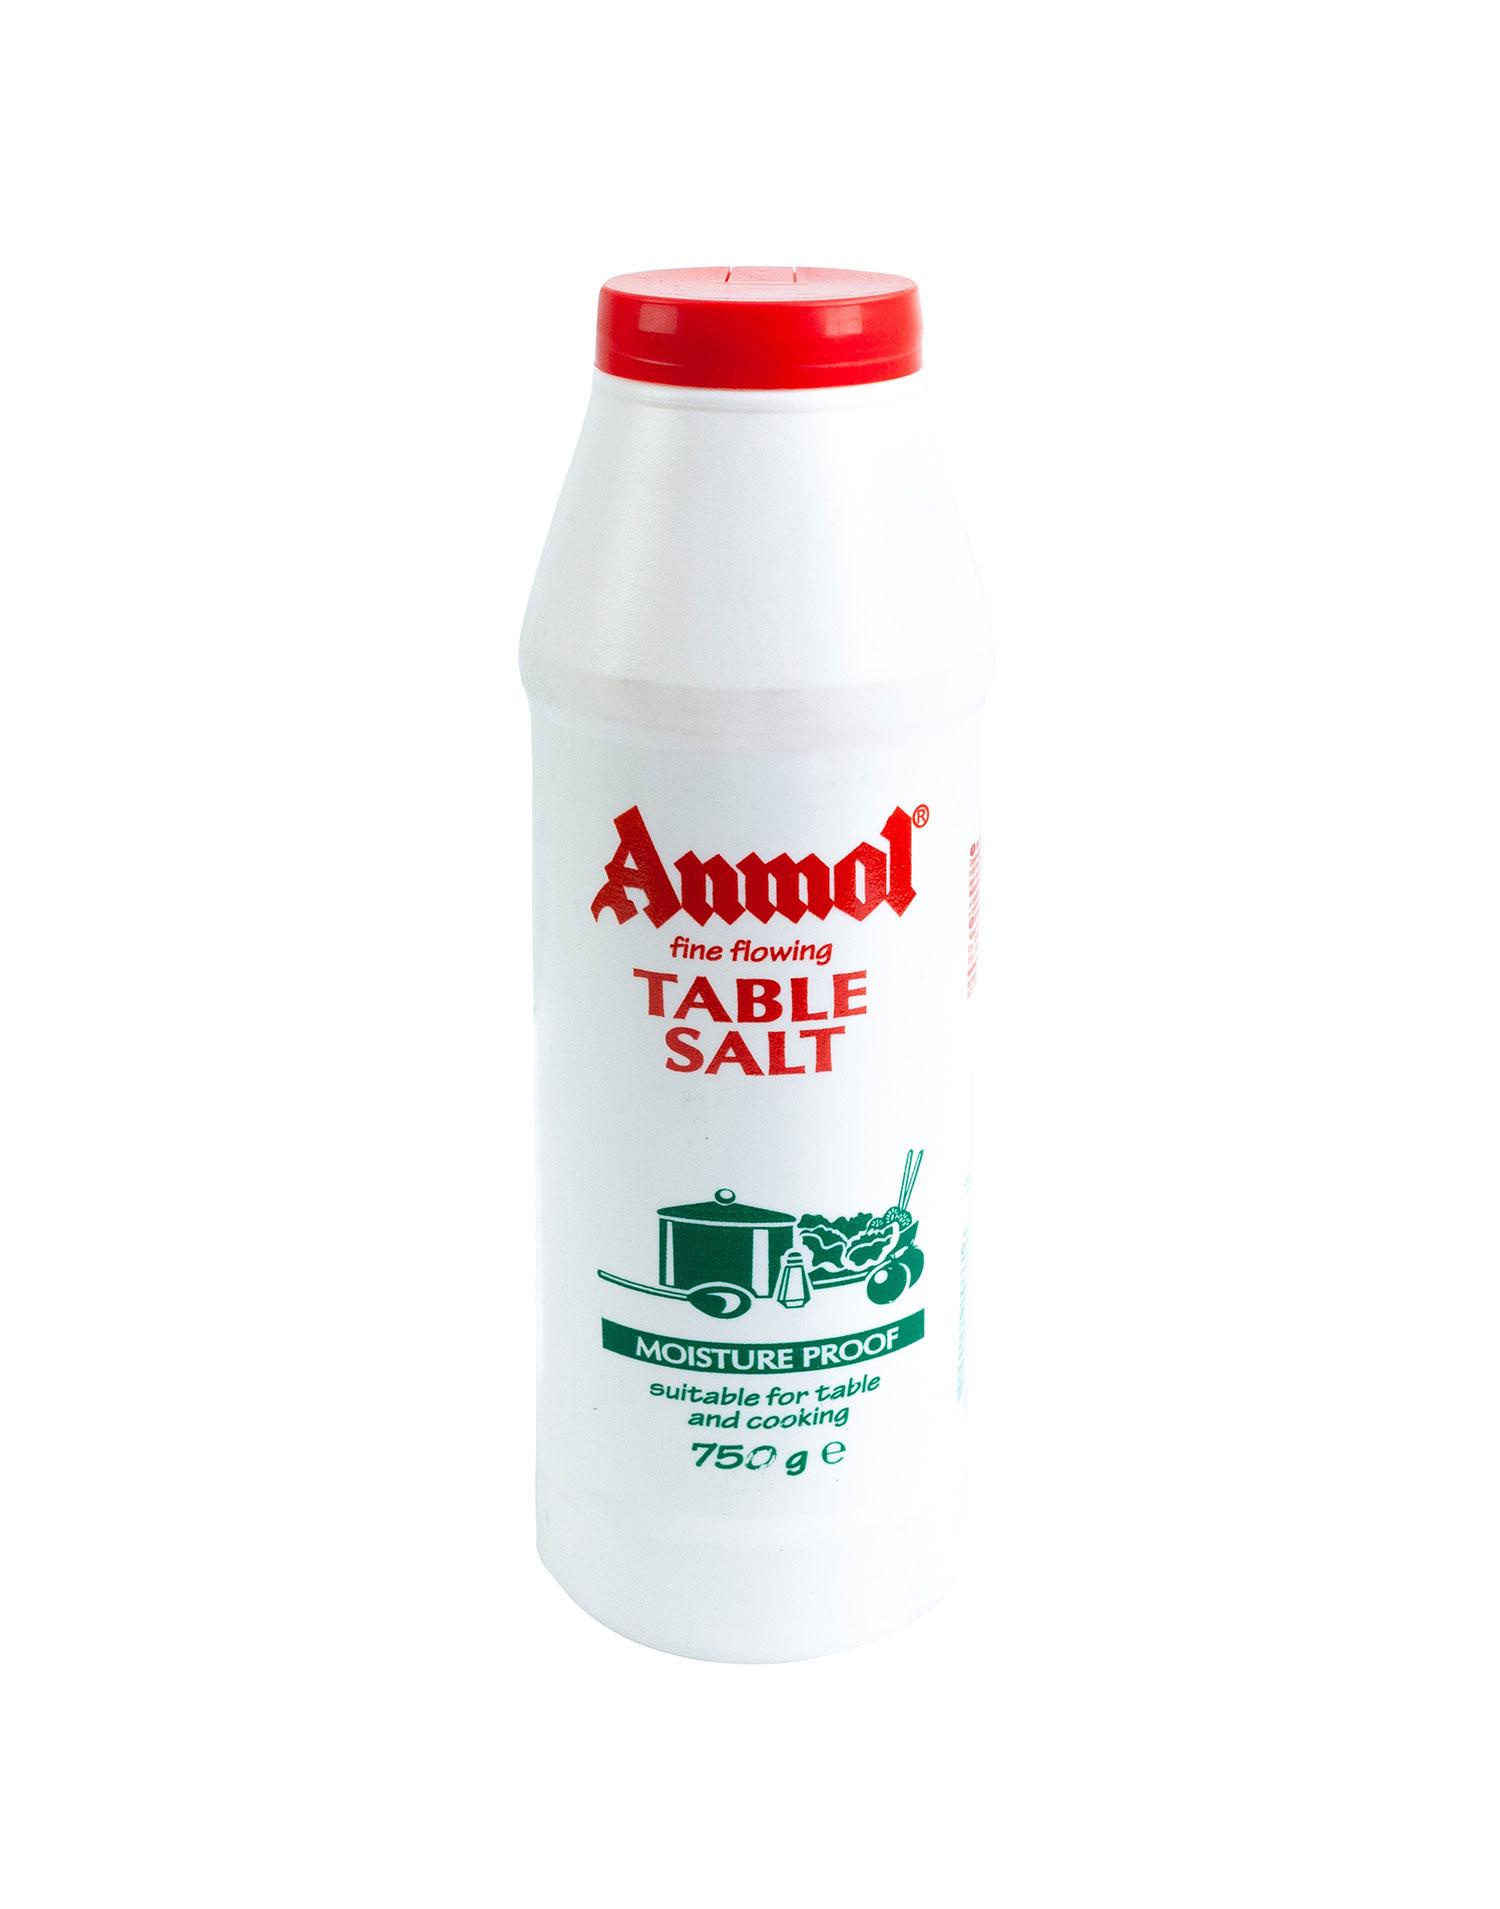 ANMOL TABLE SALT(12x750G)